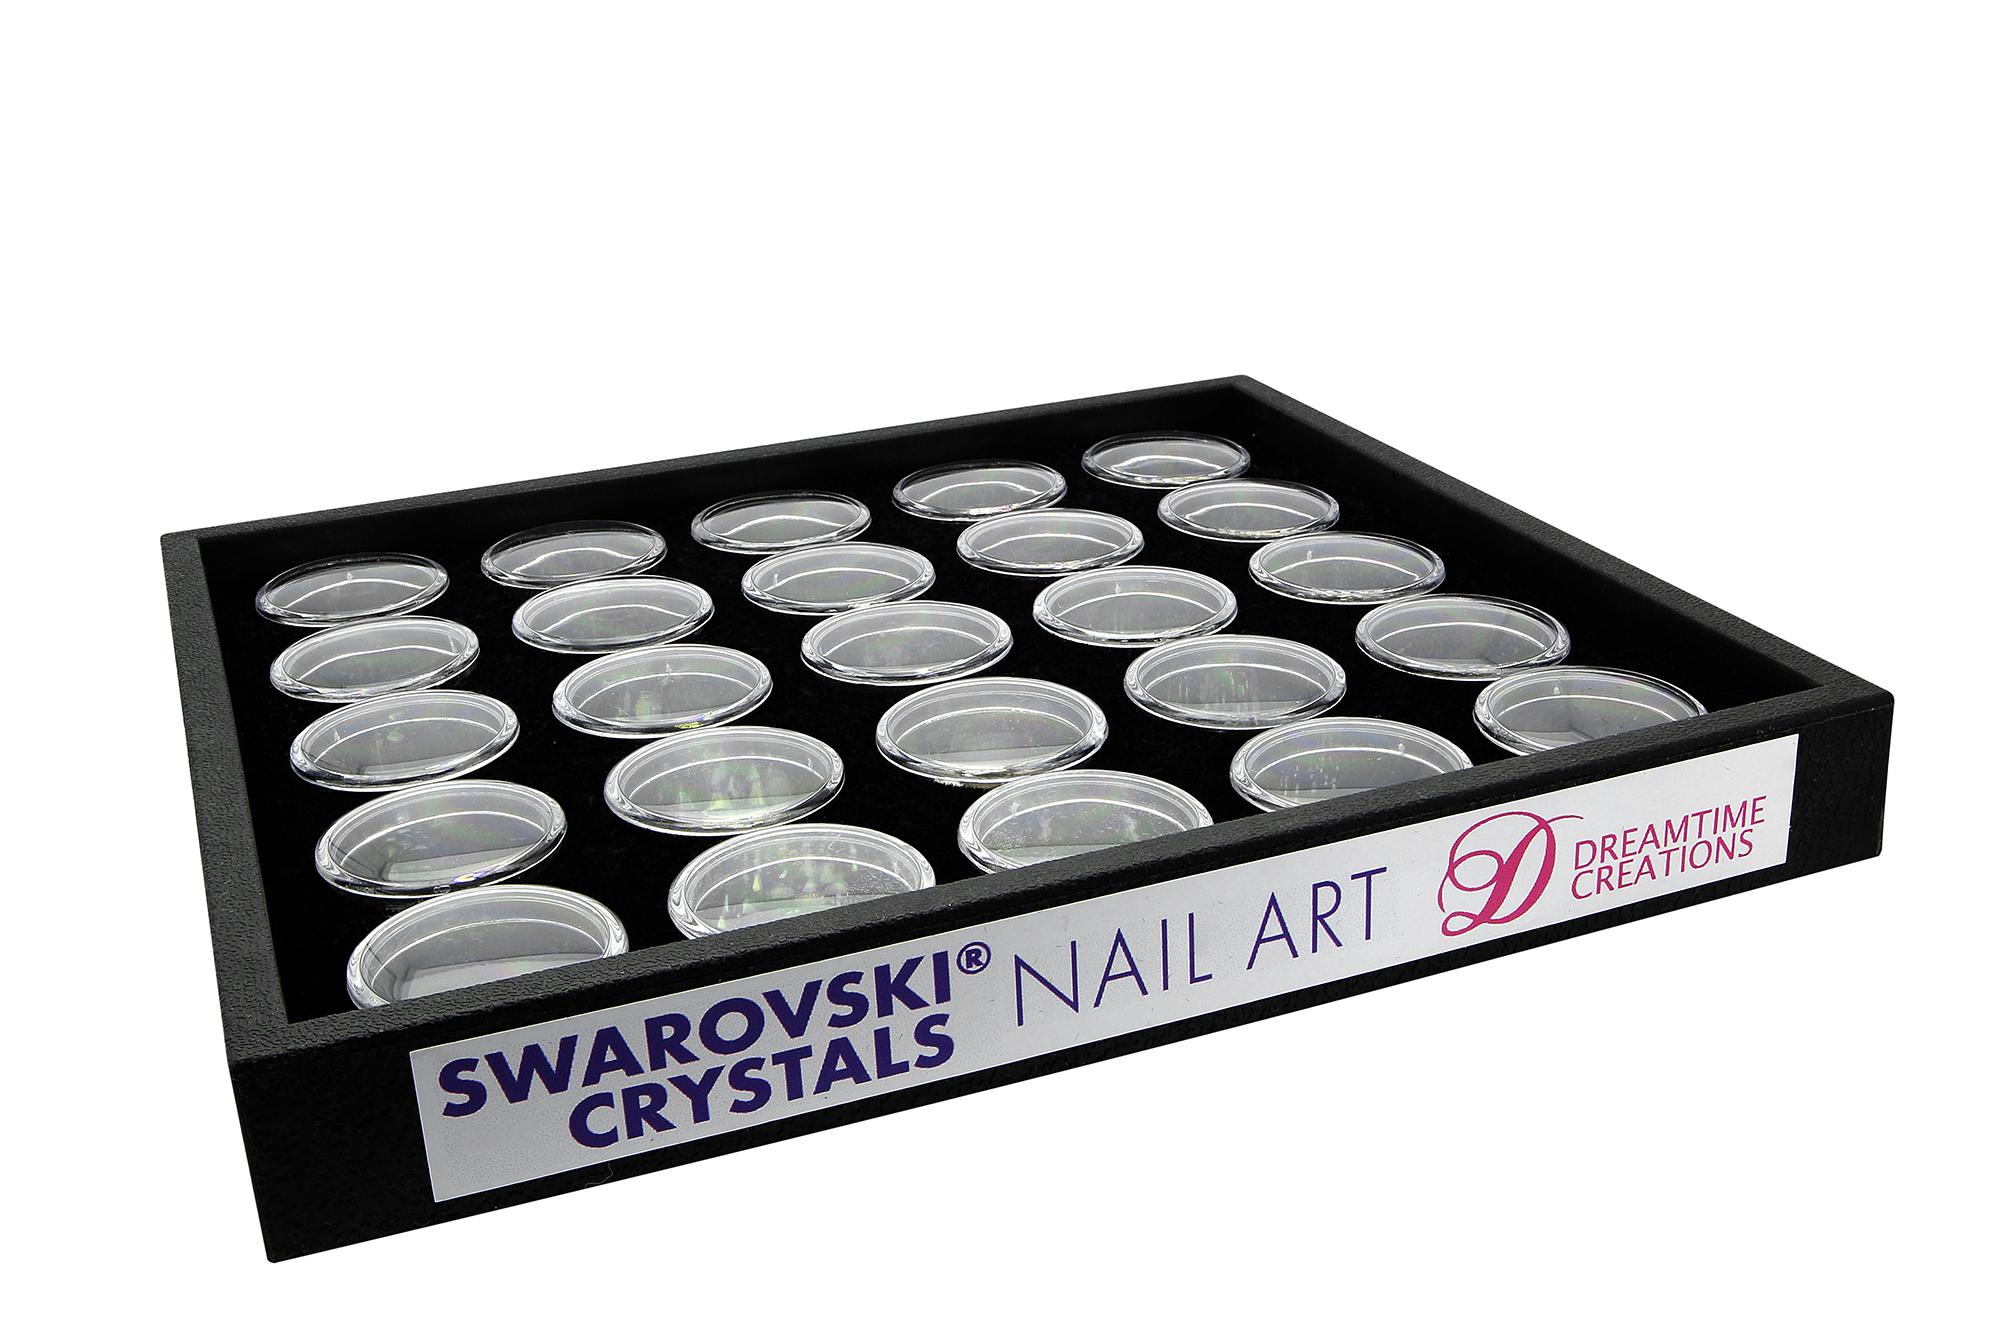 Swarovski Crystals Nail Art Starter Kit - Black Tray 25 Jars